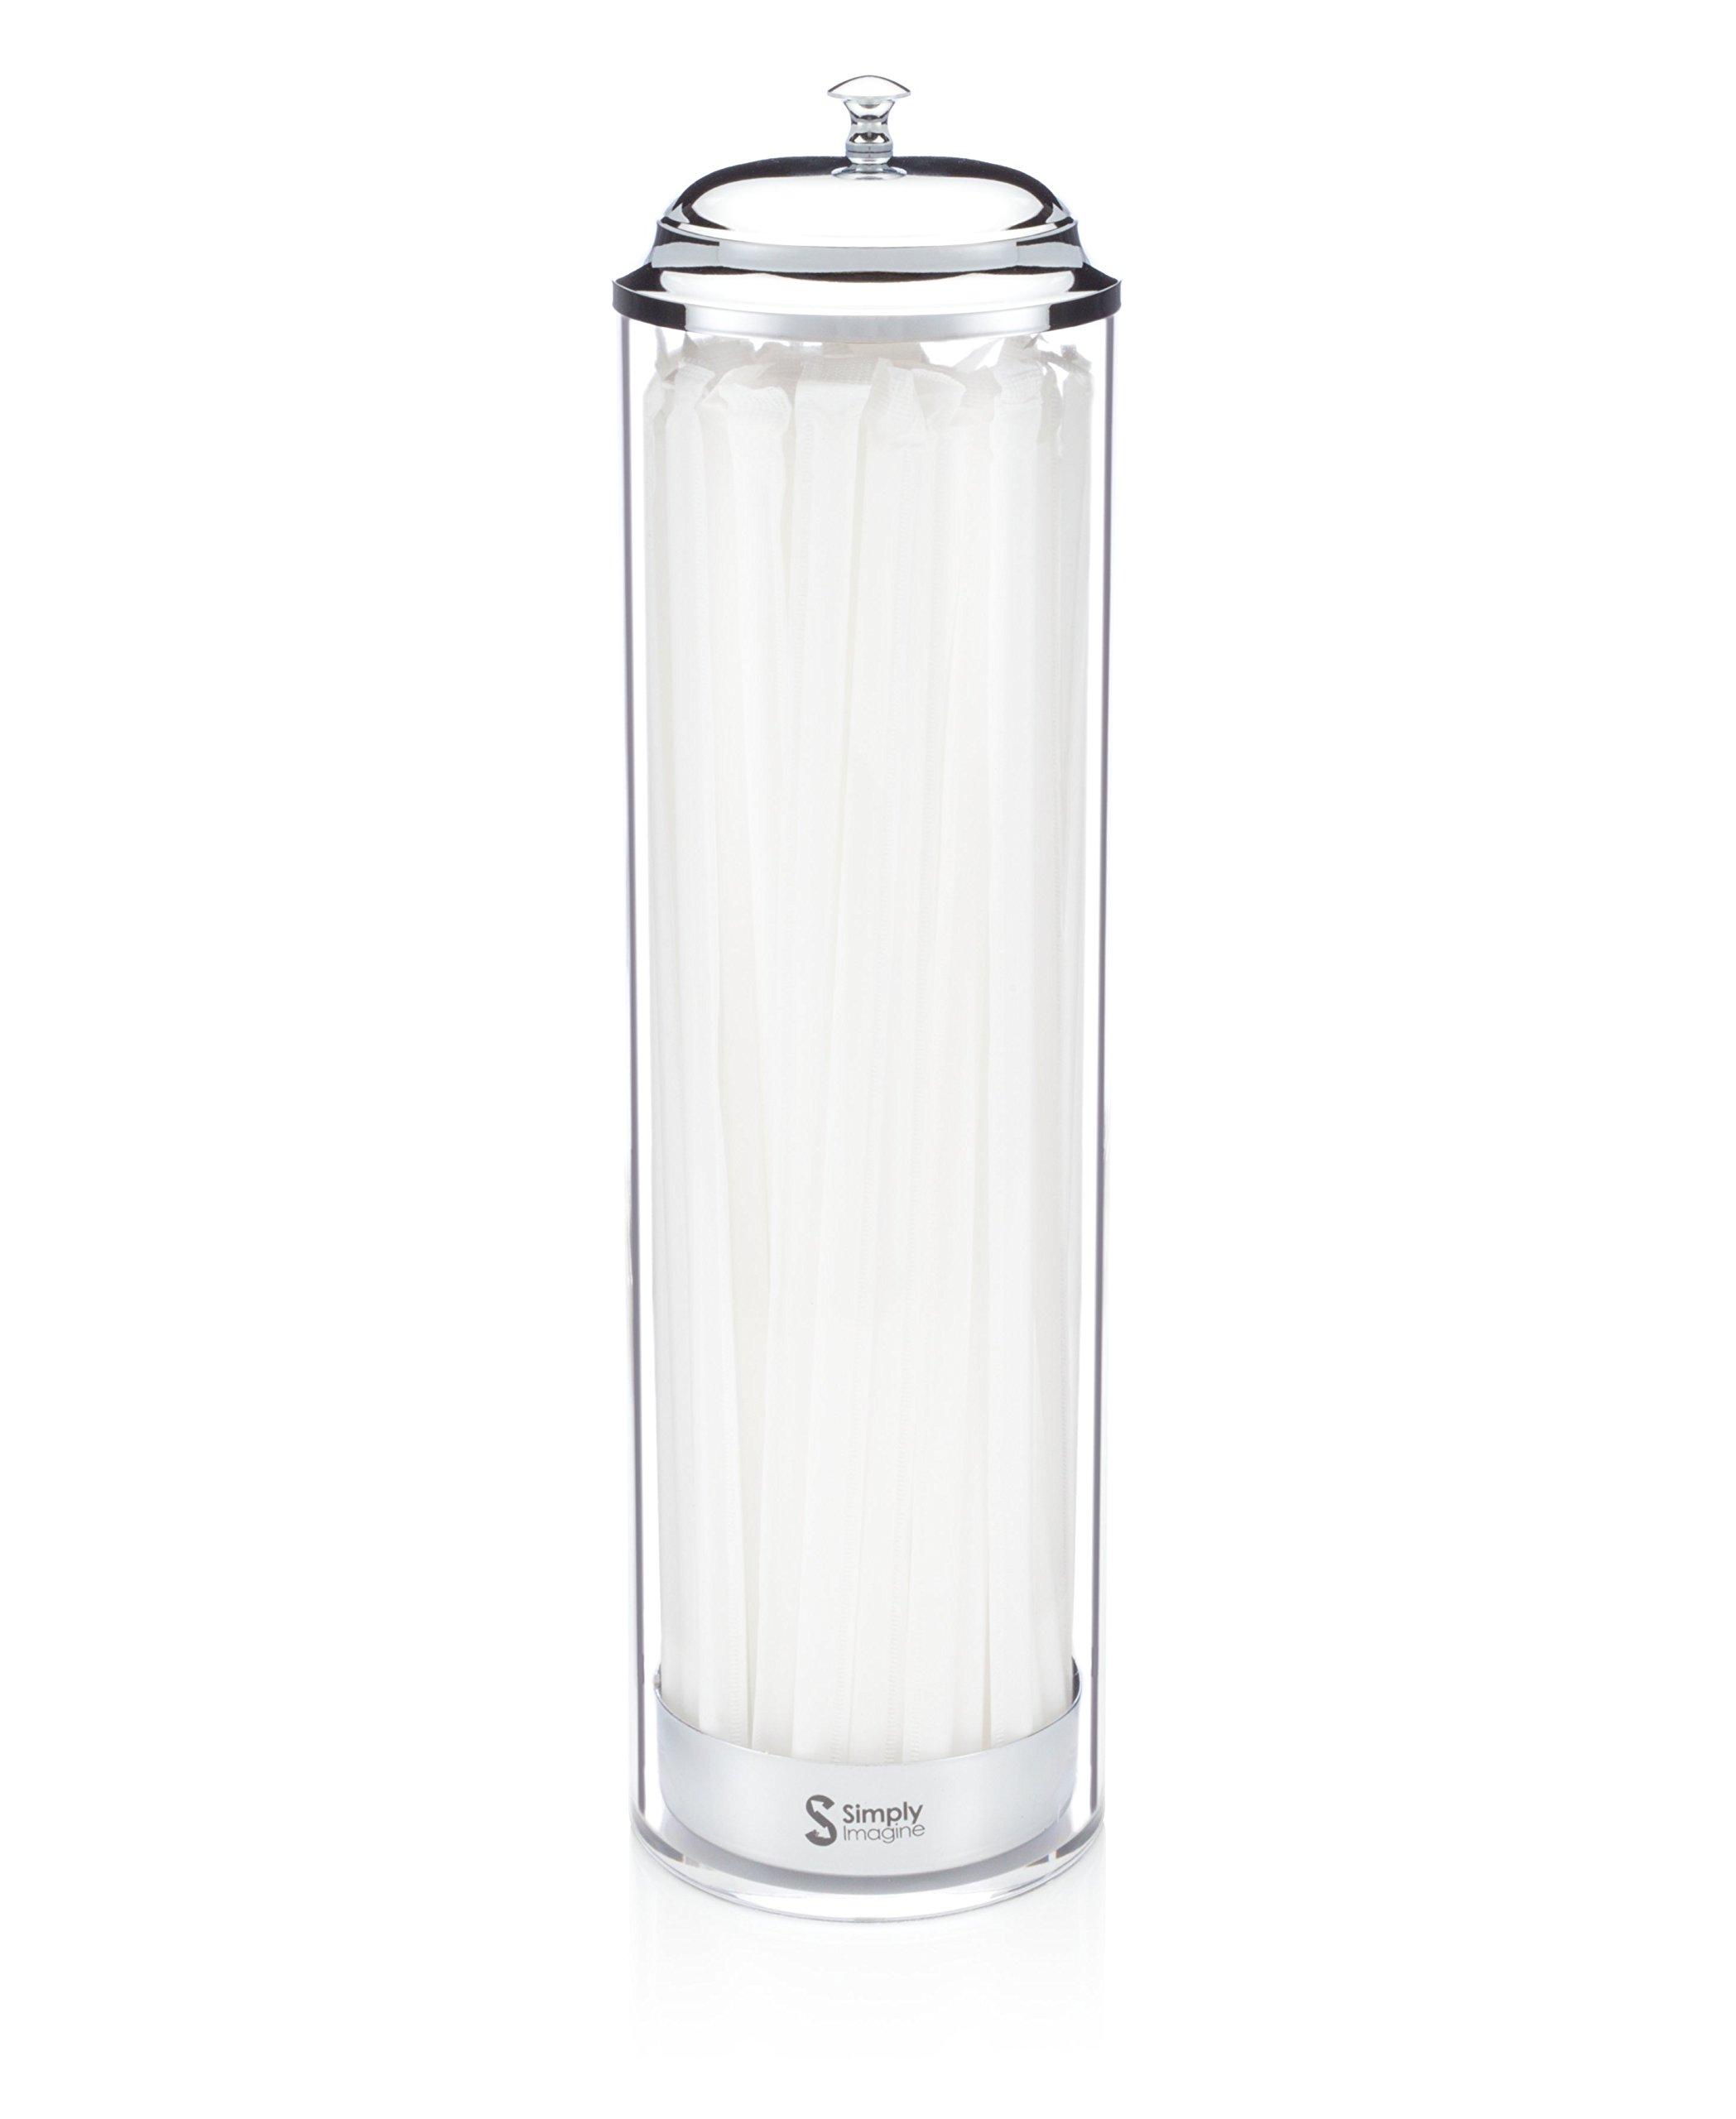 SimplyImagine Acrylic Straw Dispenser